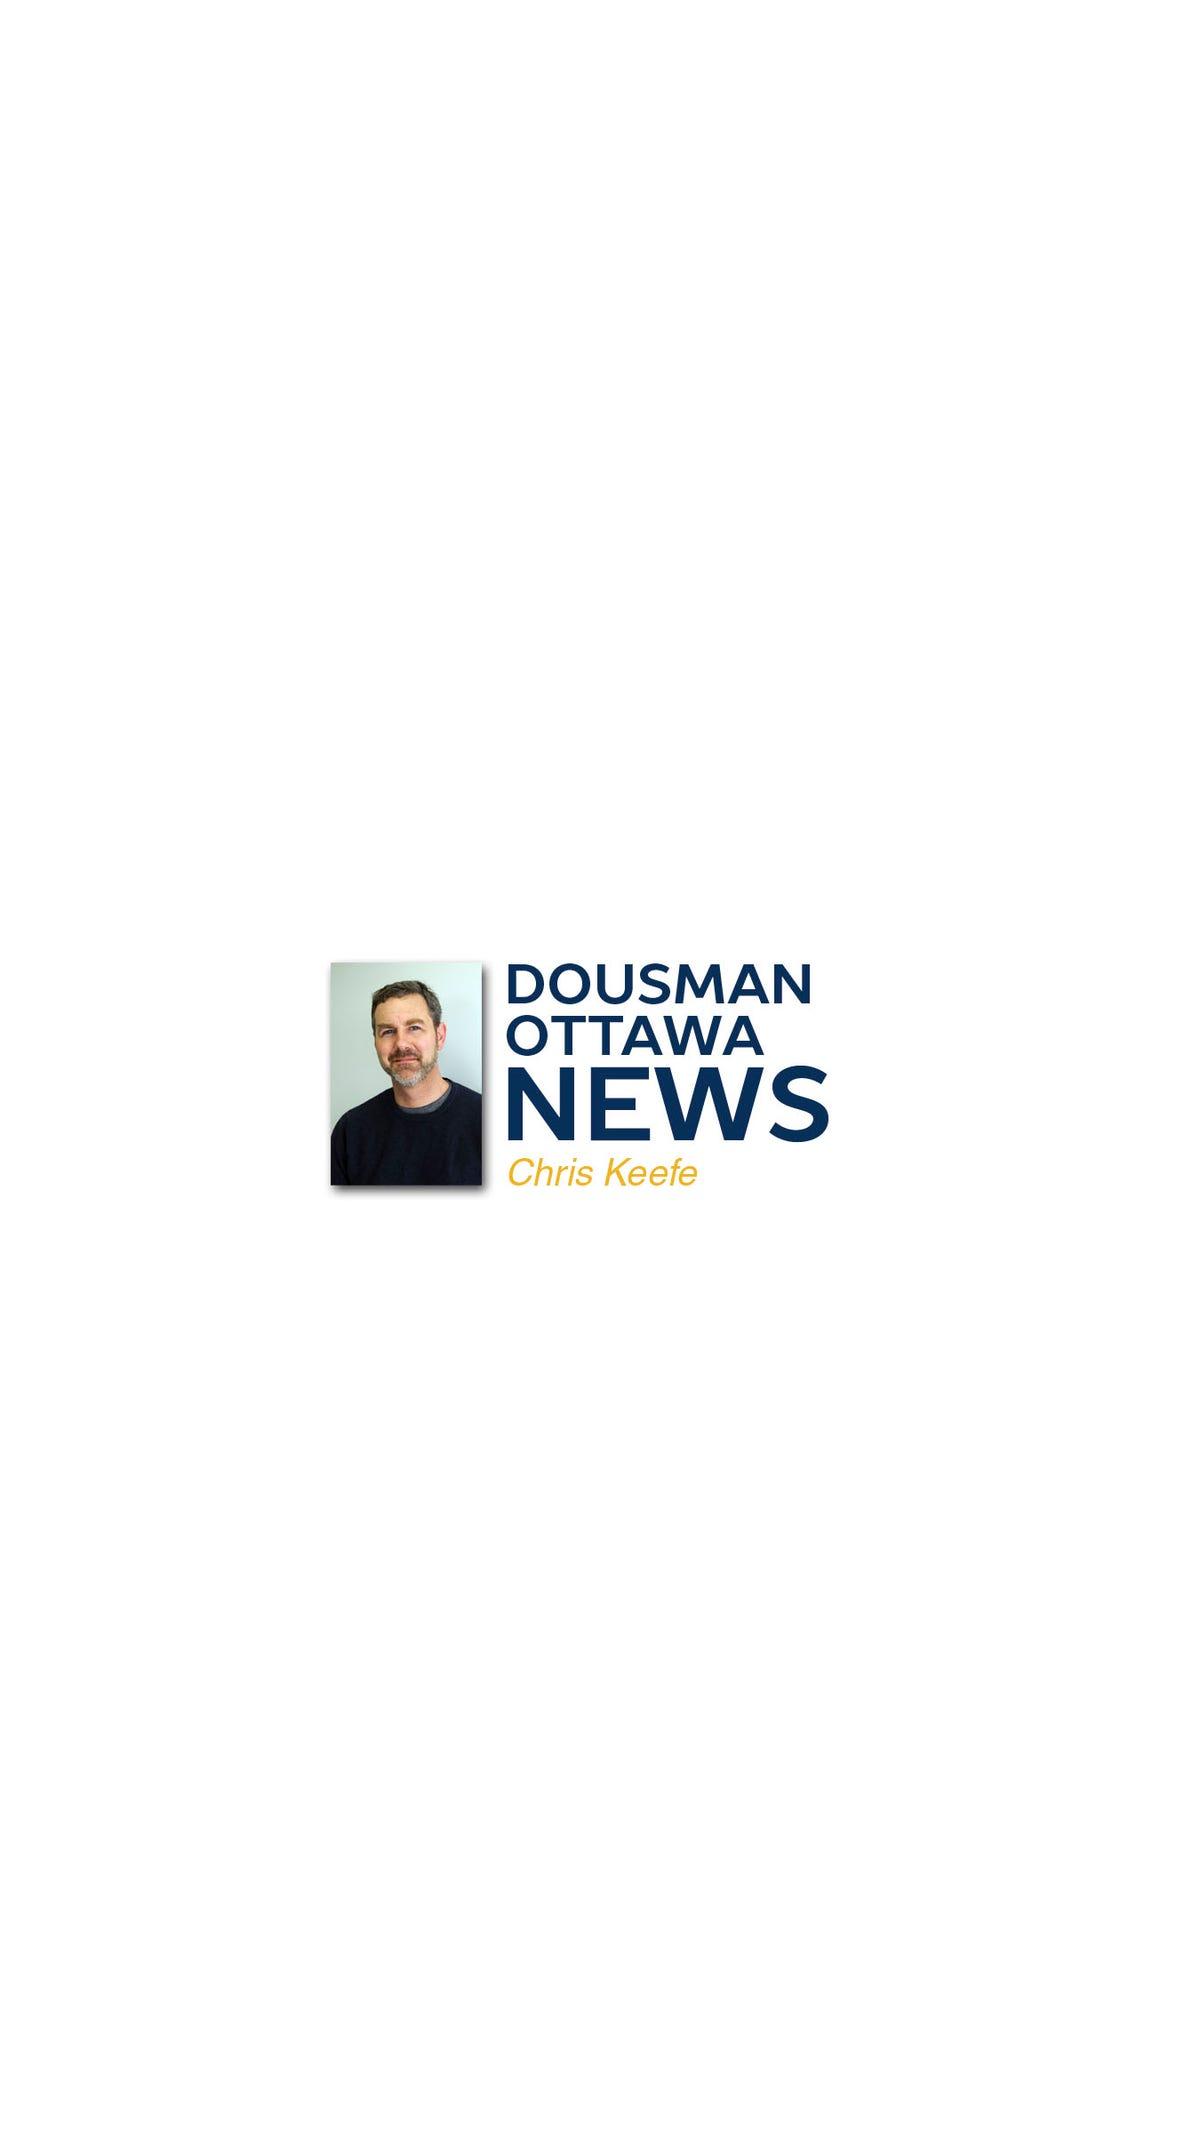 Dousman-Ottawa News: Dec  1, 2016